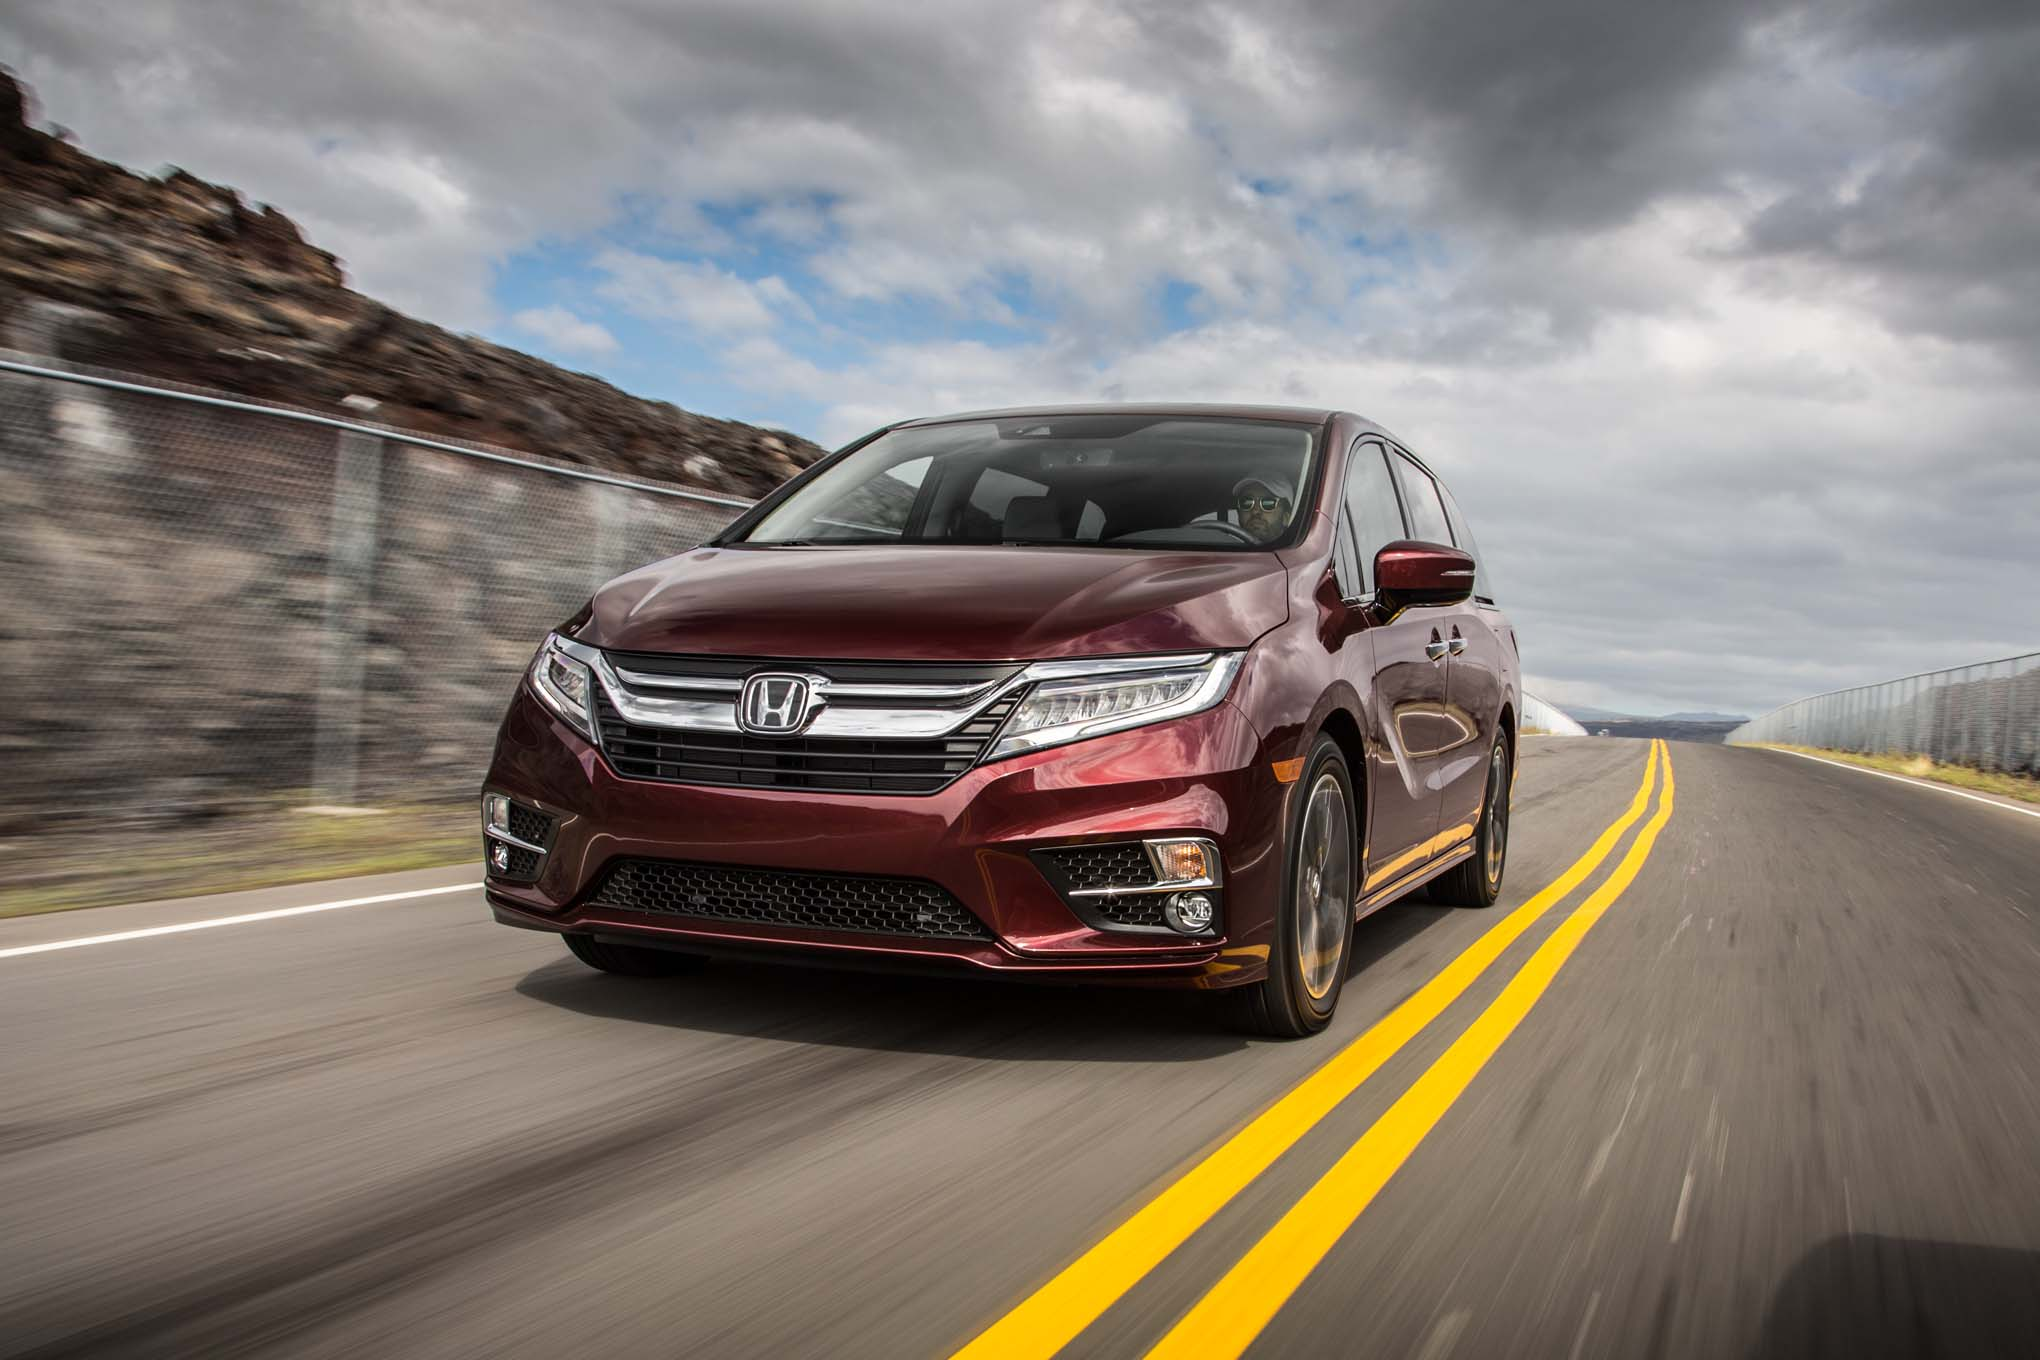 2018 Honda Odyssey Front Three Quarter In Motion 03 1